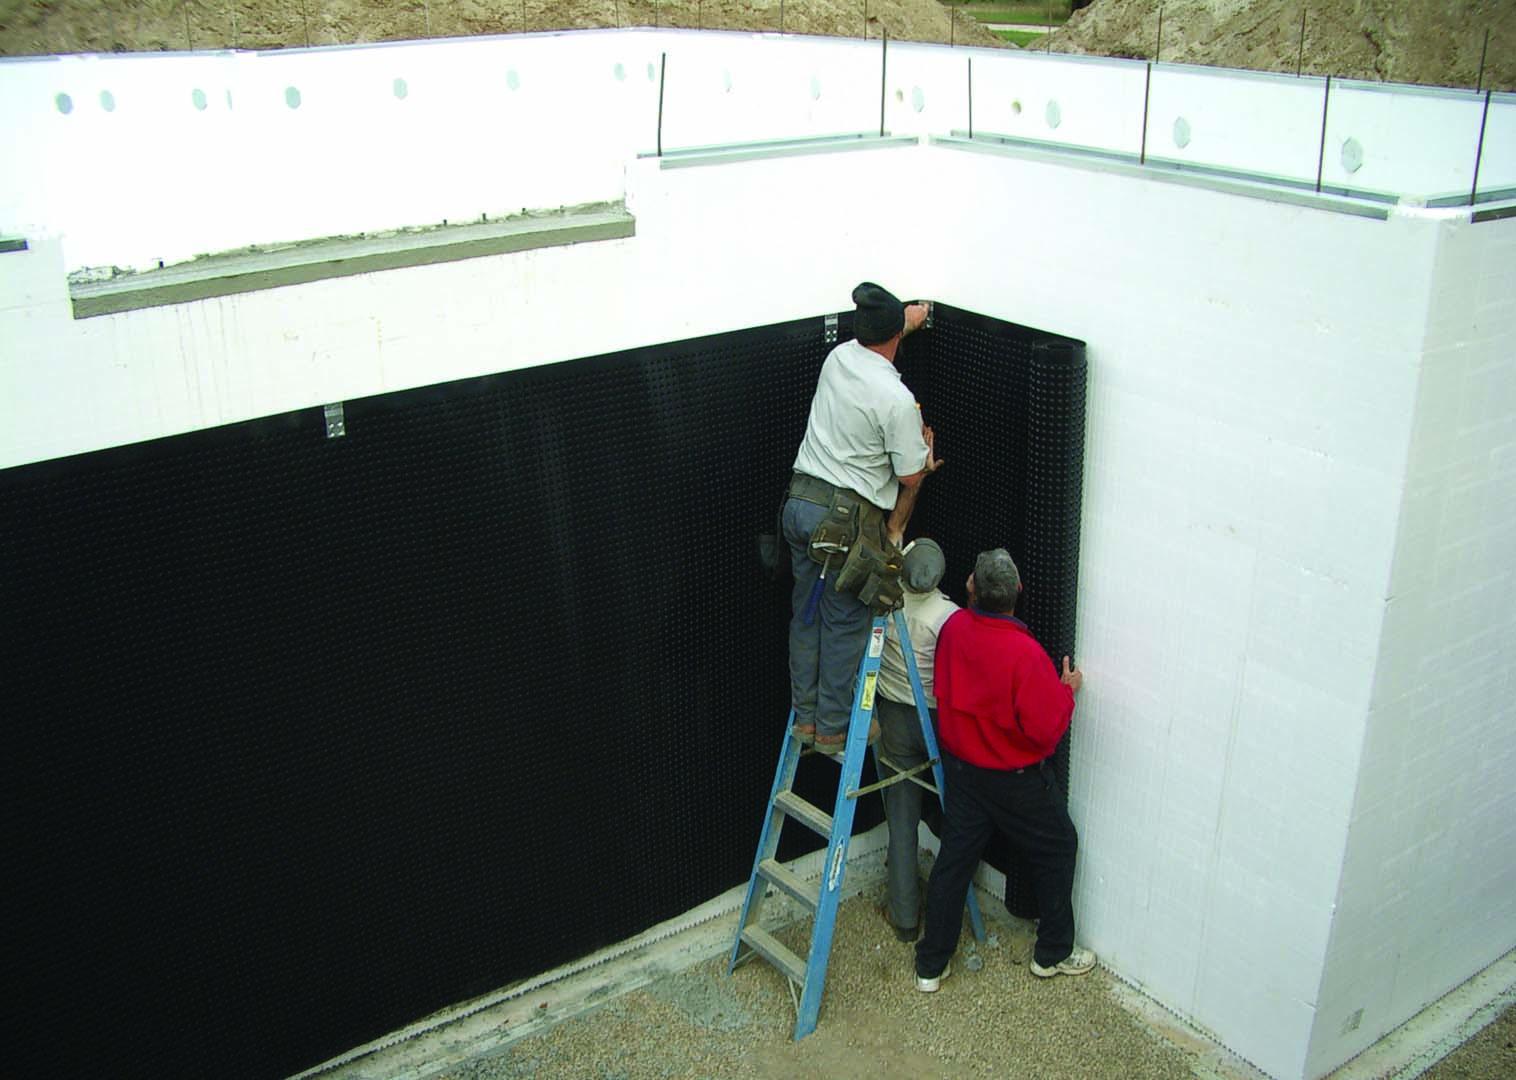 Buildblock Project Stone Creek Wins Icf Builder Award